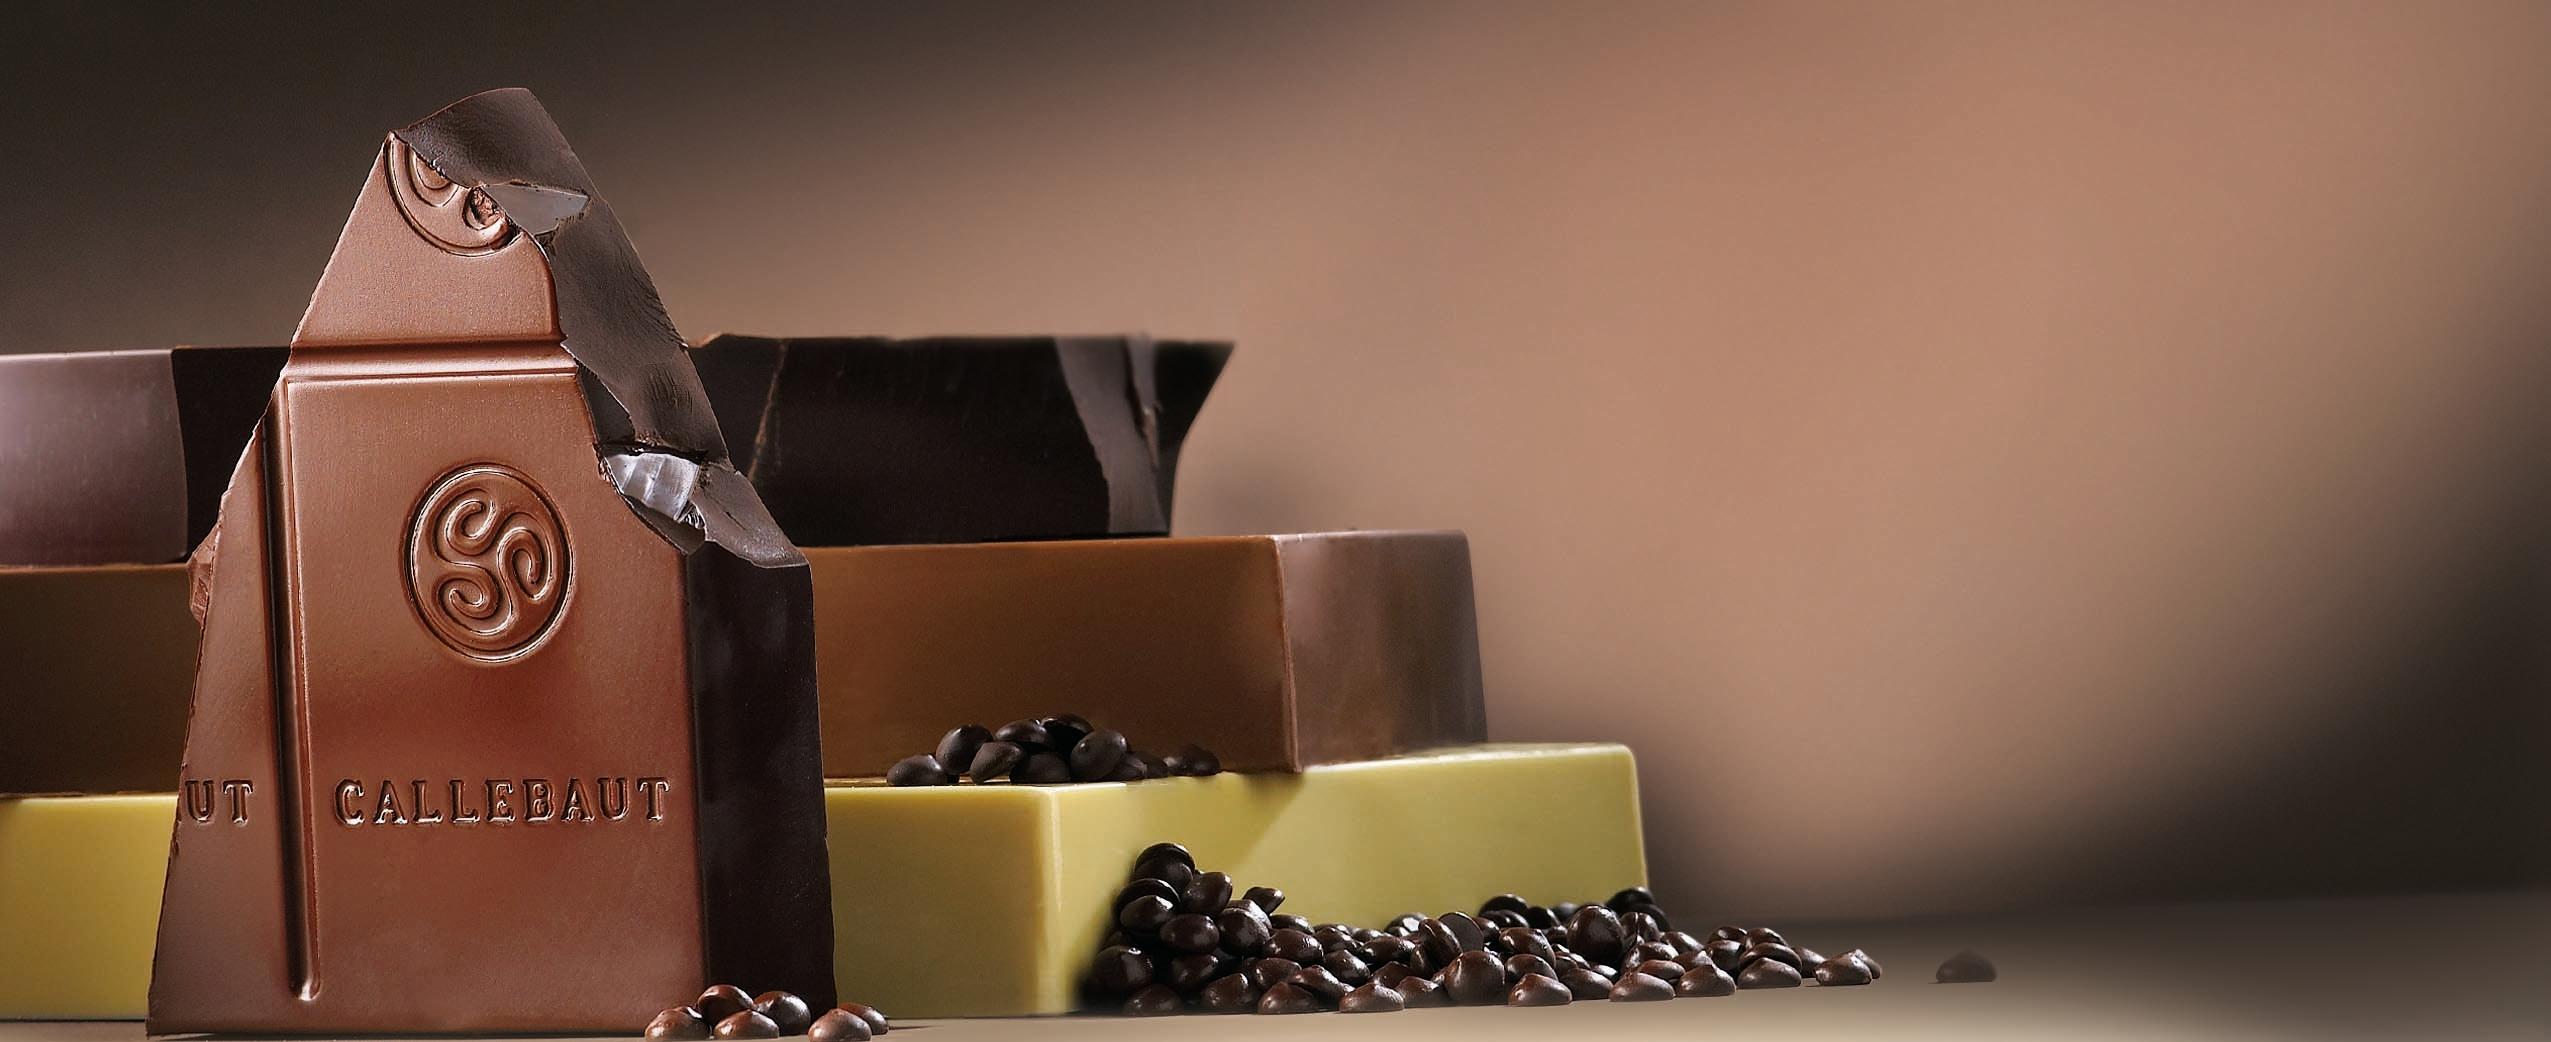 Callebaut 100% Chocolate (Unsweetened)  #CM Block